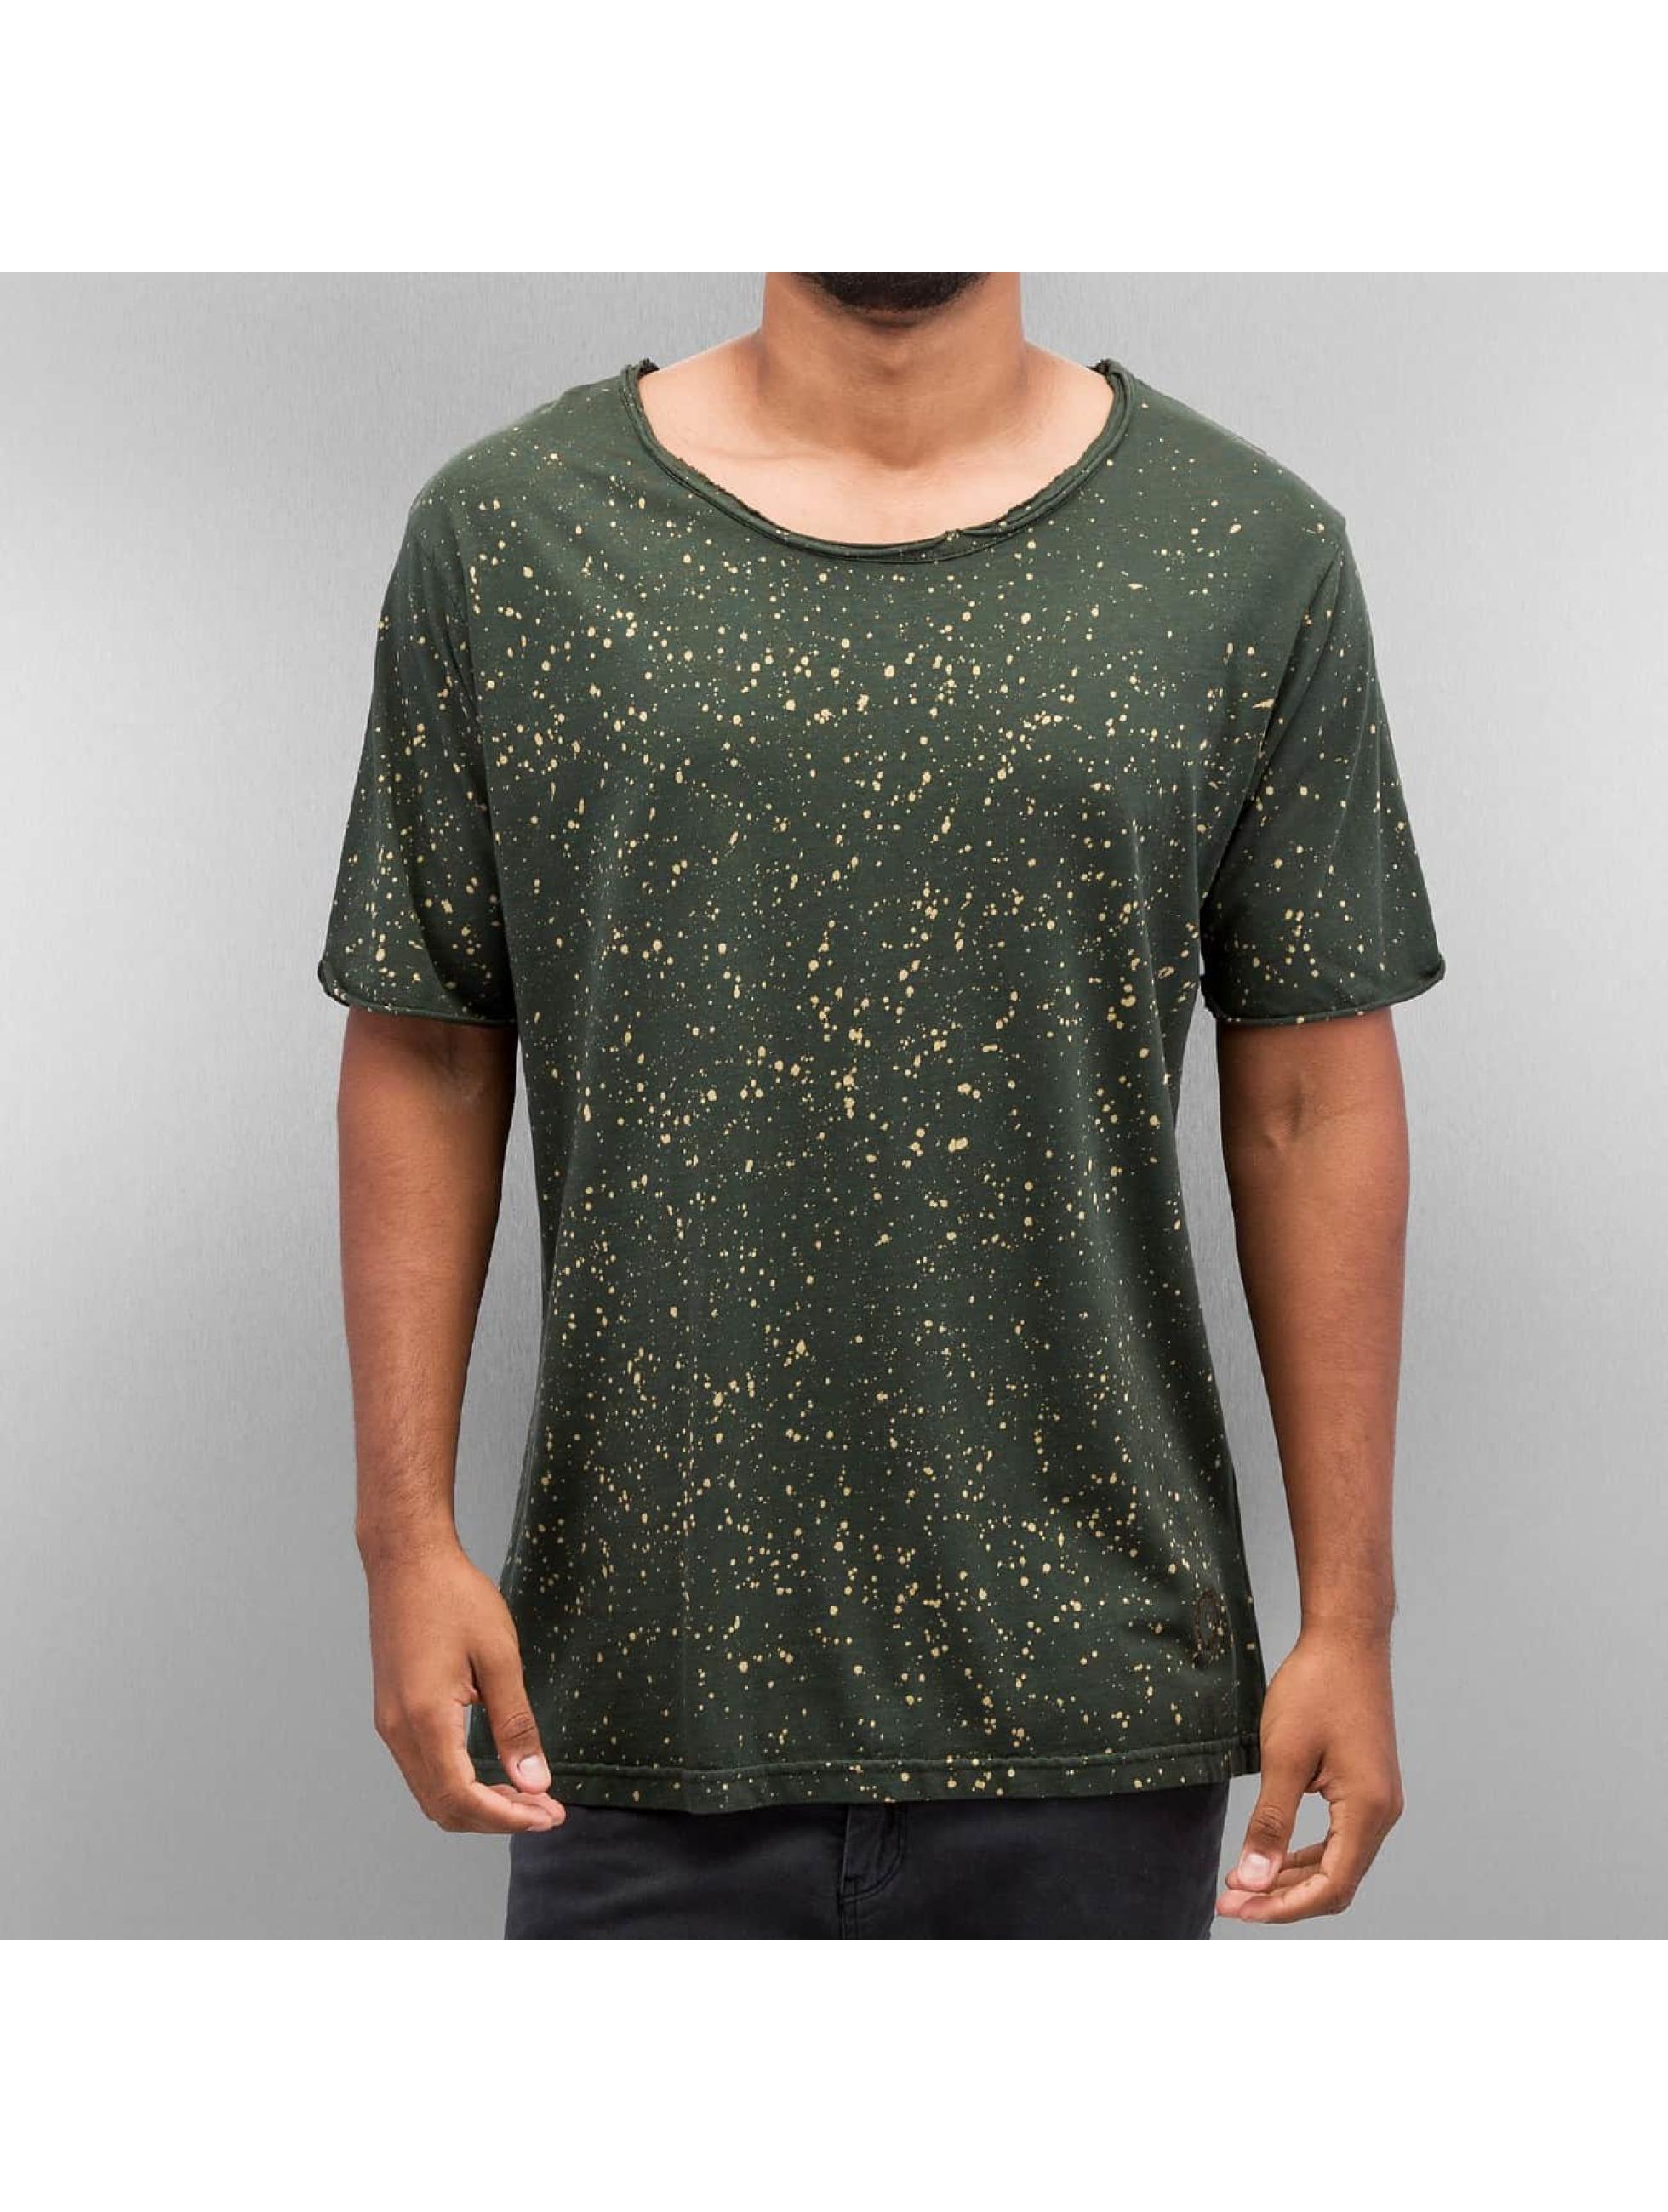 Yezz T-shirt Dots oliv